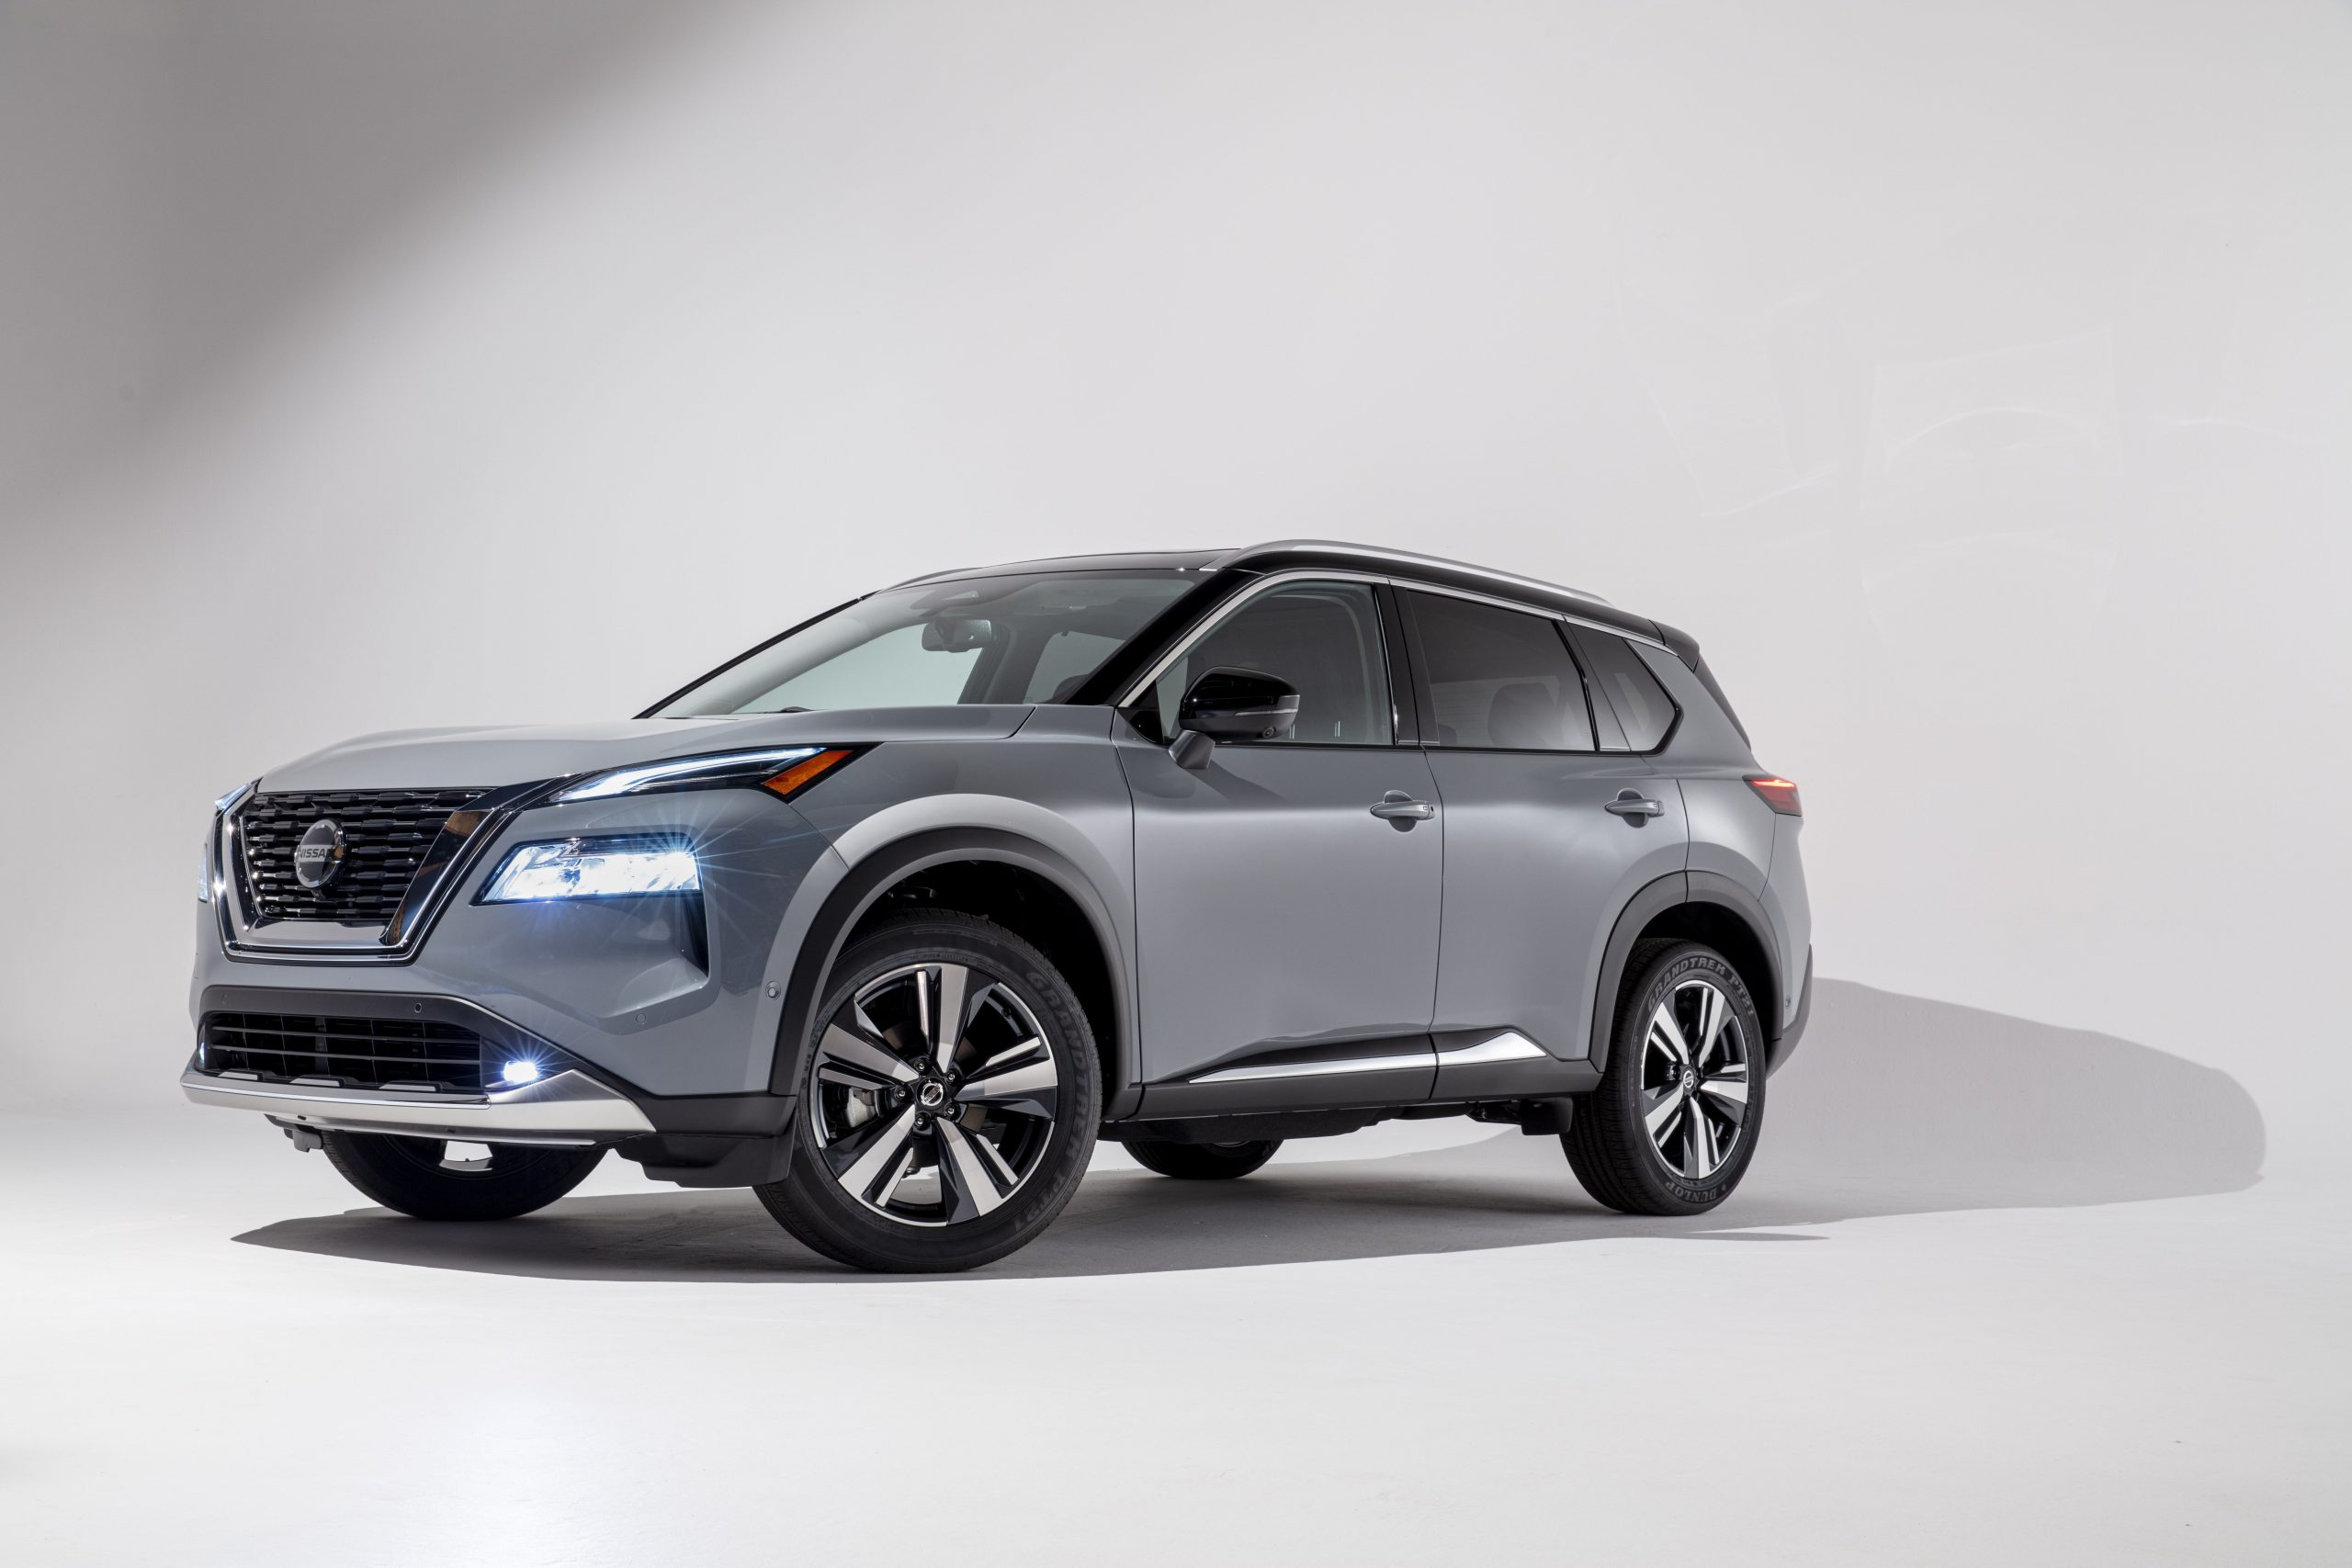 4 Nissan Rogue Looks Like a Big Improvement - Nissan Rogue Sport 2021 Release Date